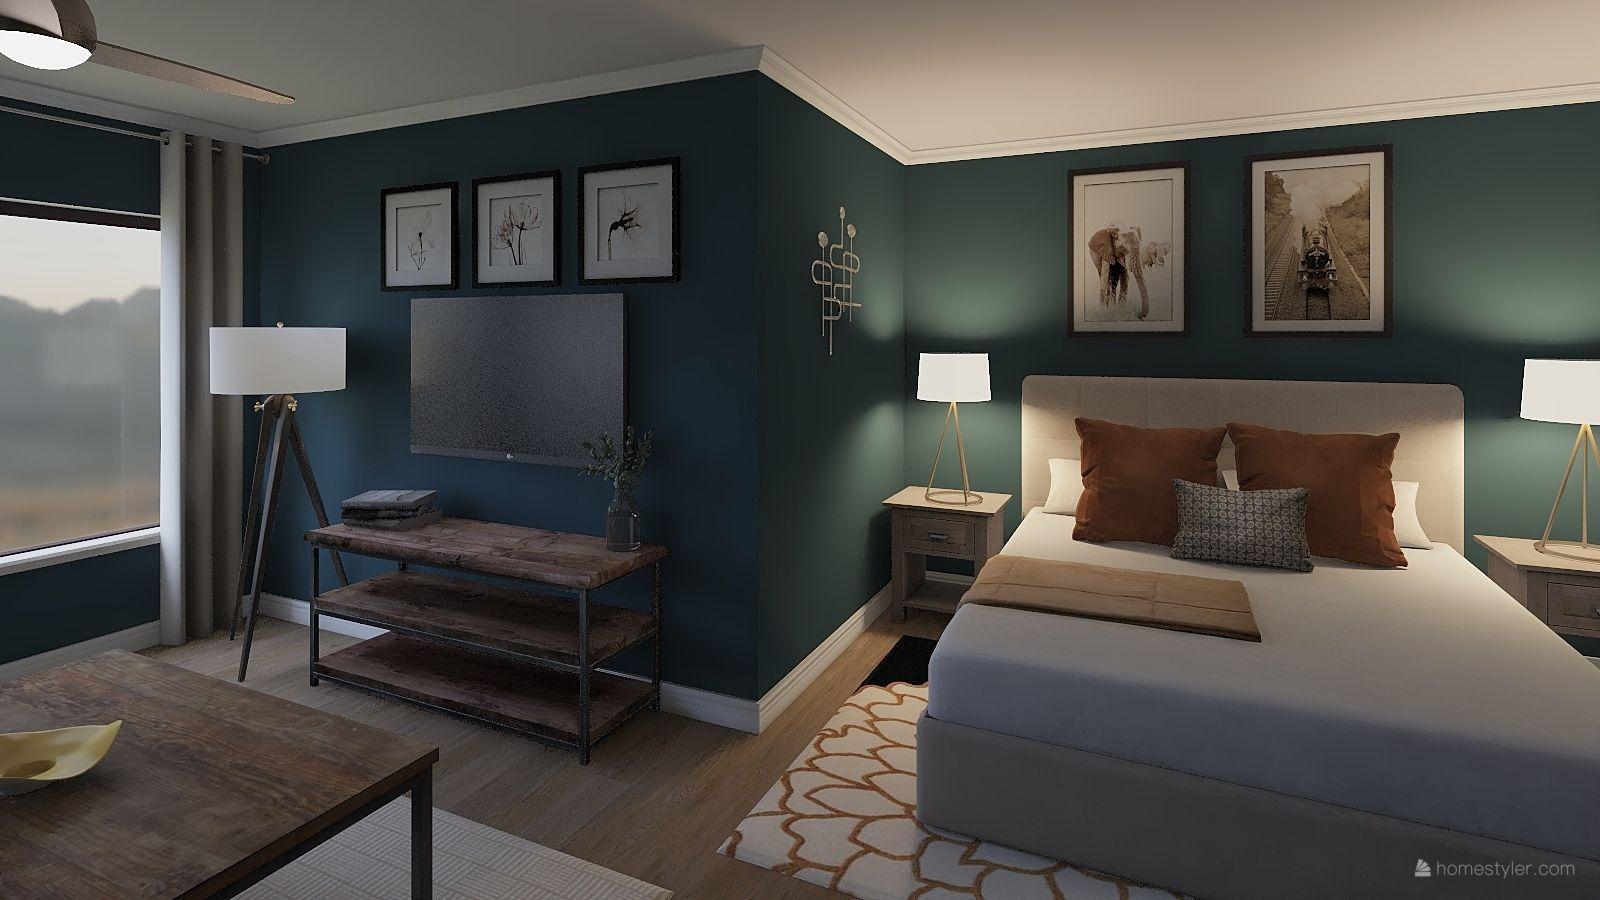 Bedroom Design By Nicole Bass 3d Home Design Software Home Design Software Home Decor Bedroom design online 3d